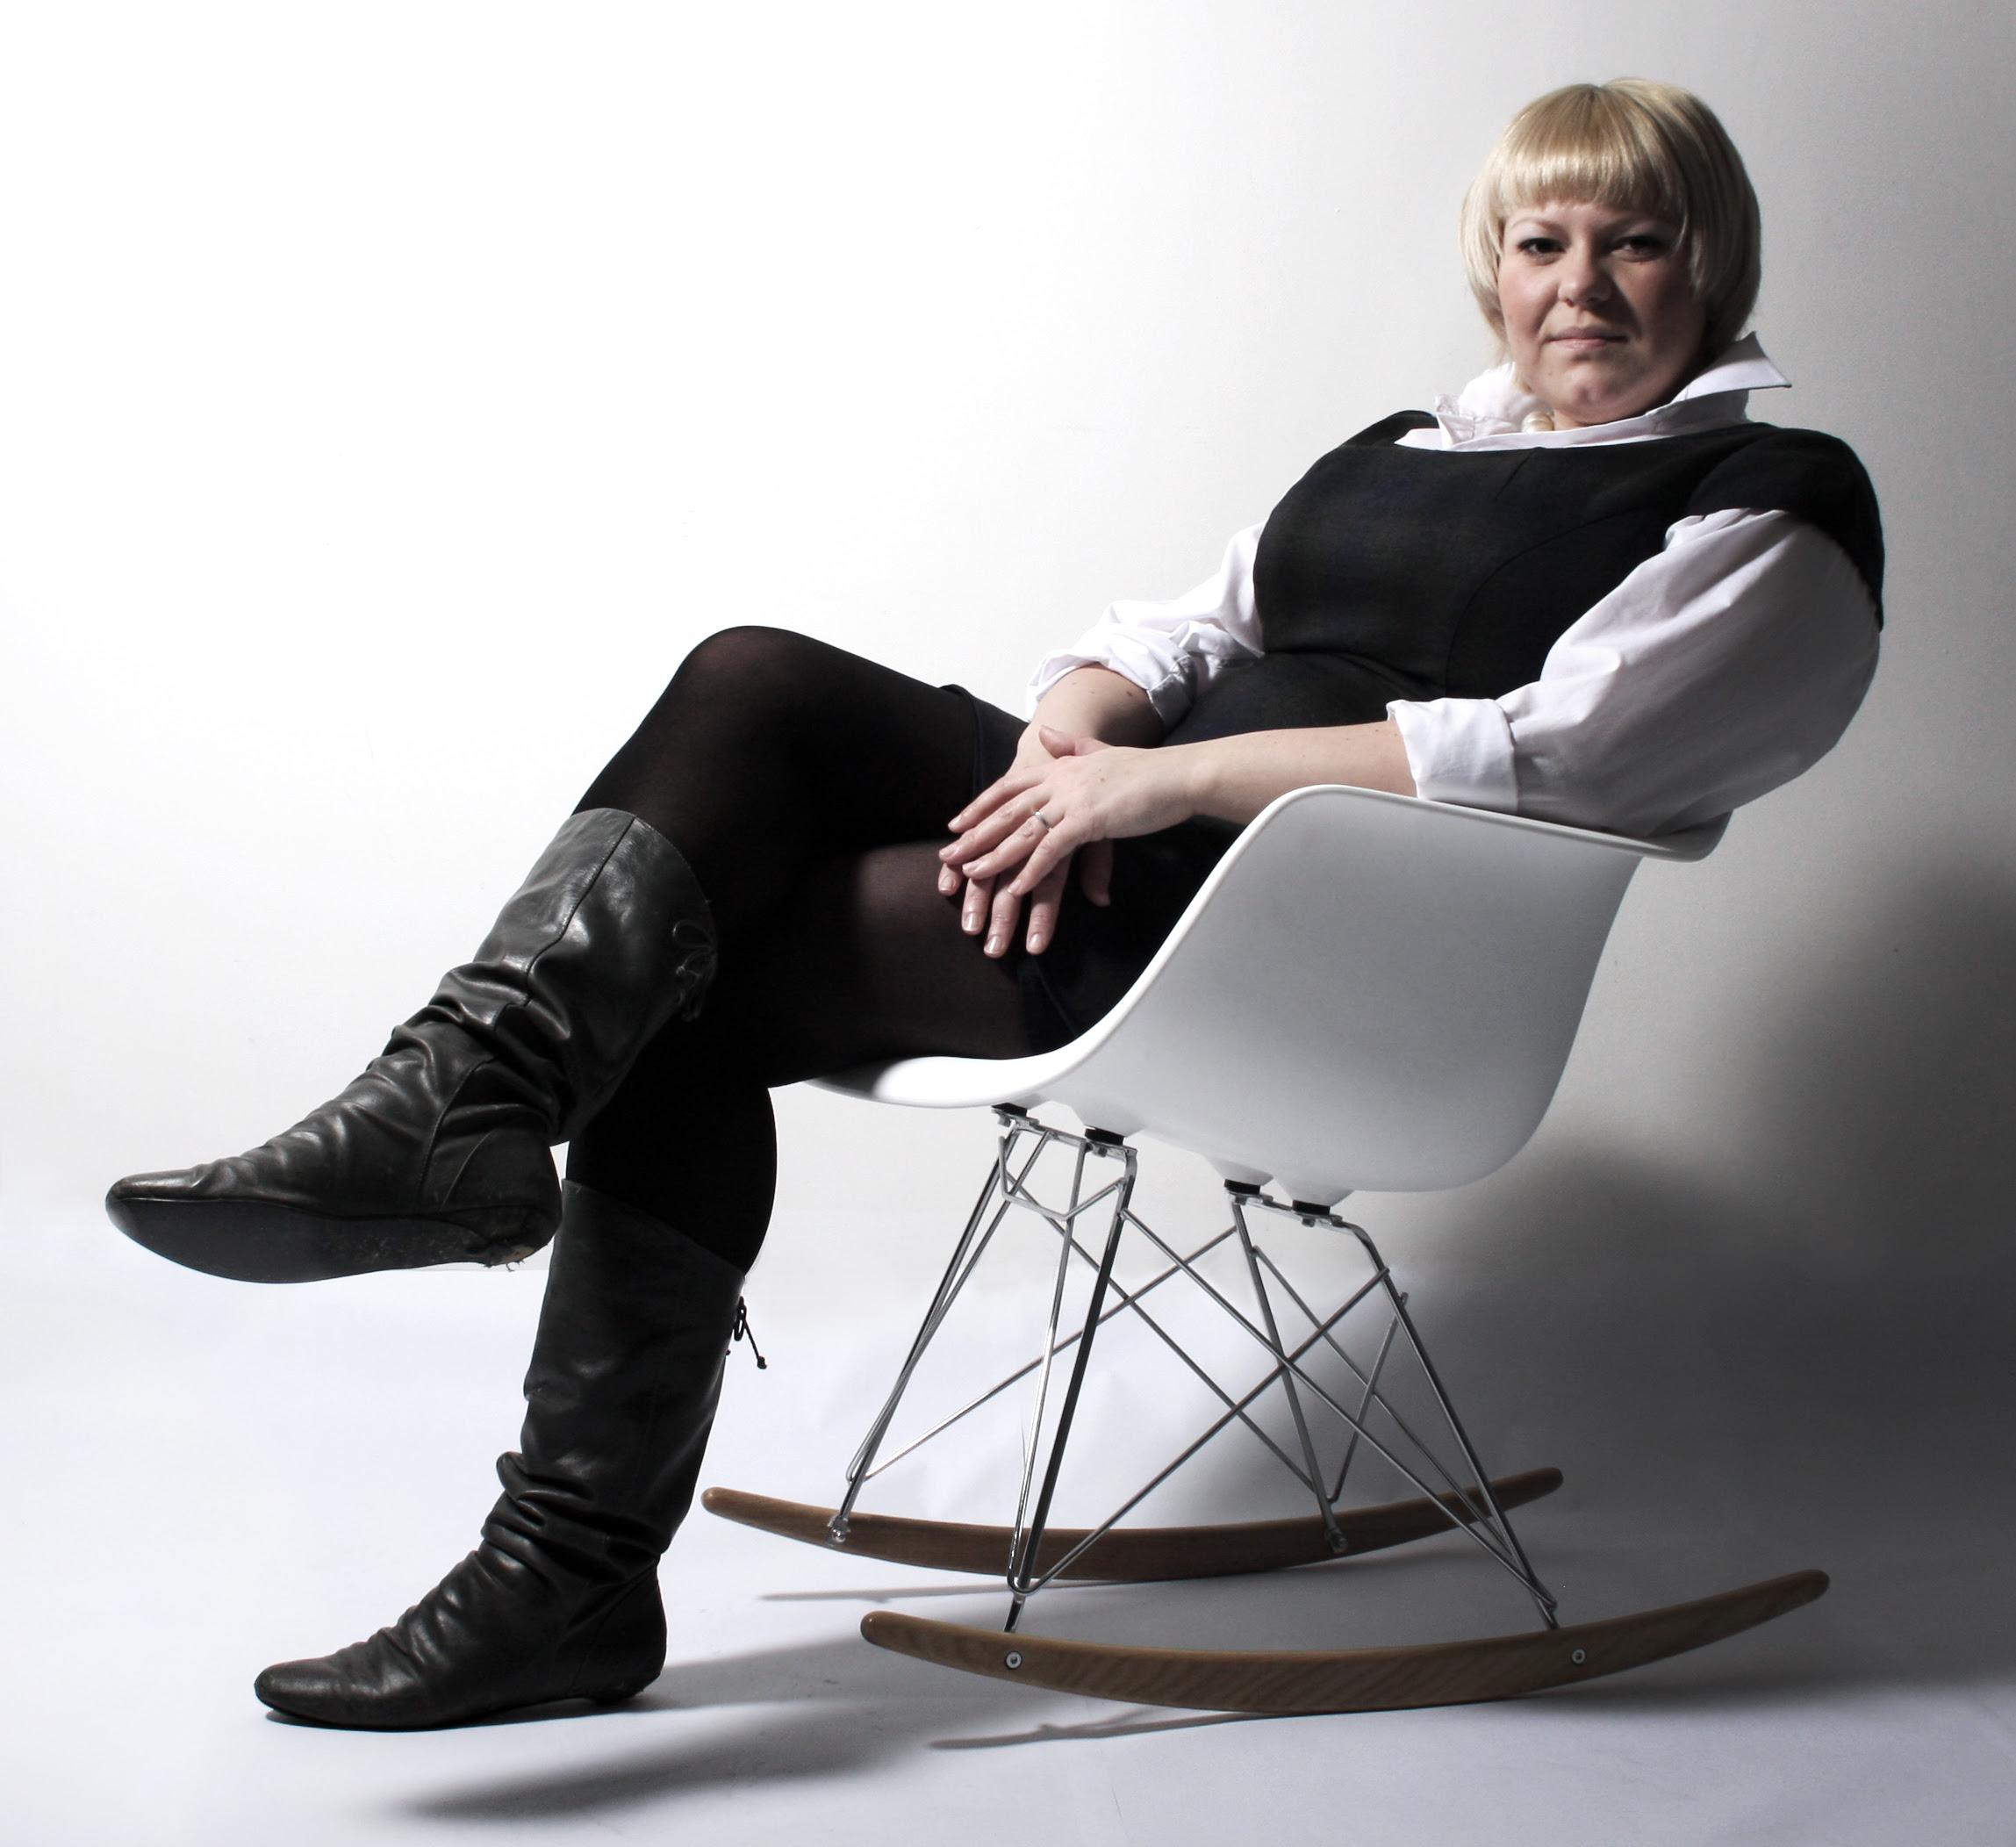 Award winning Interior Designer Kimberly Moore shares her top